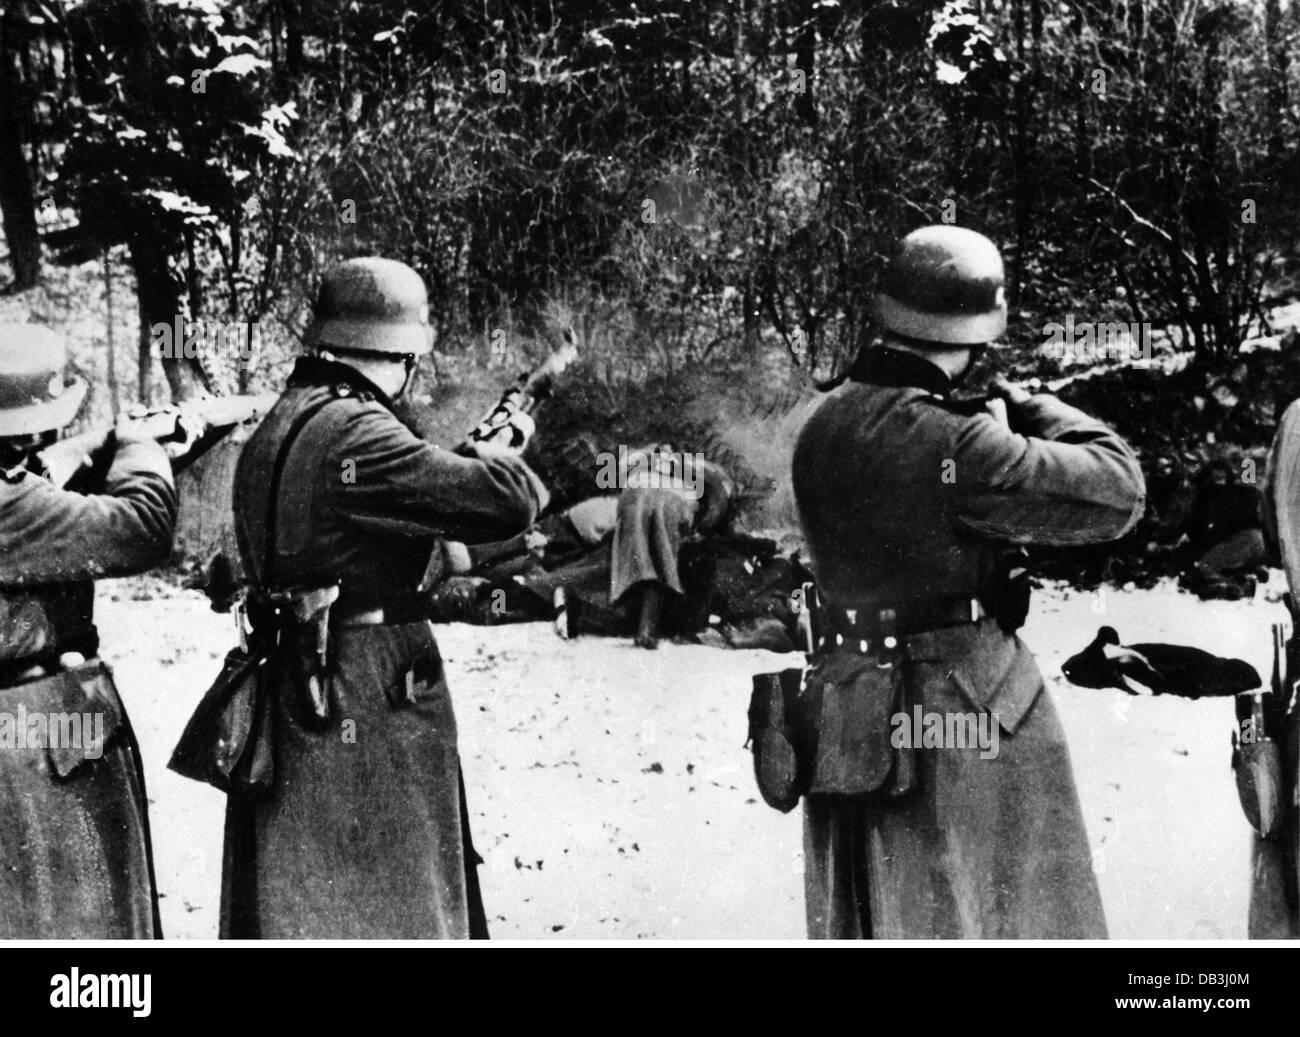 events Second World War  WWII Poland German occupation